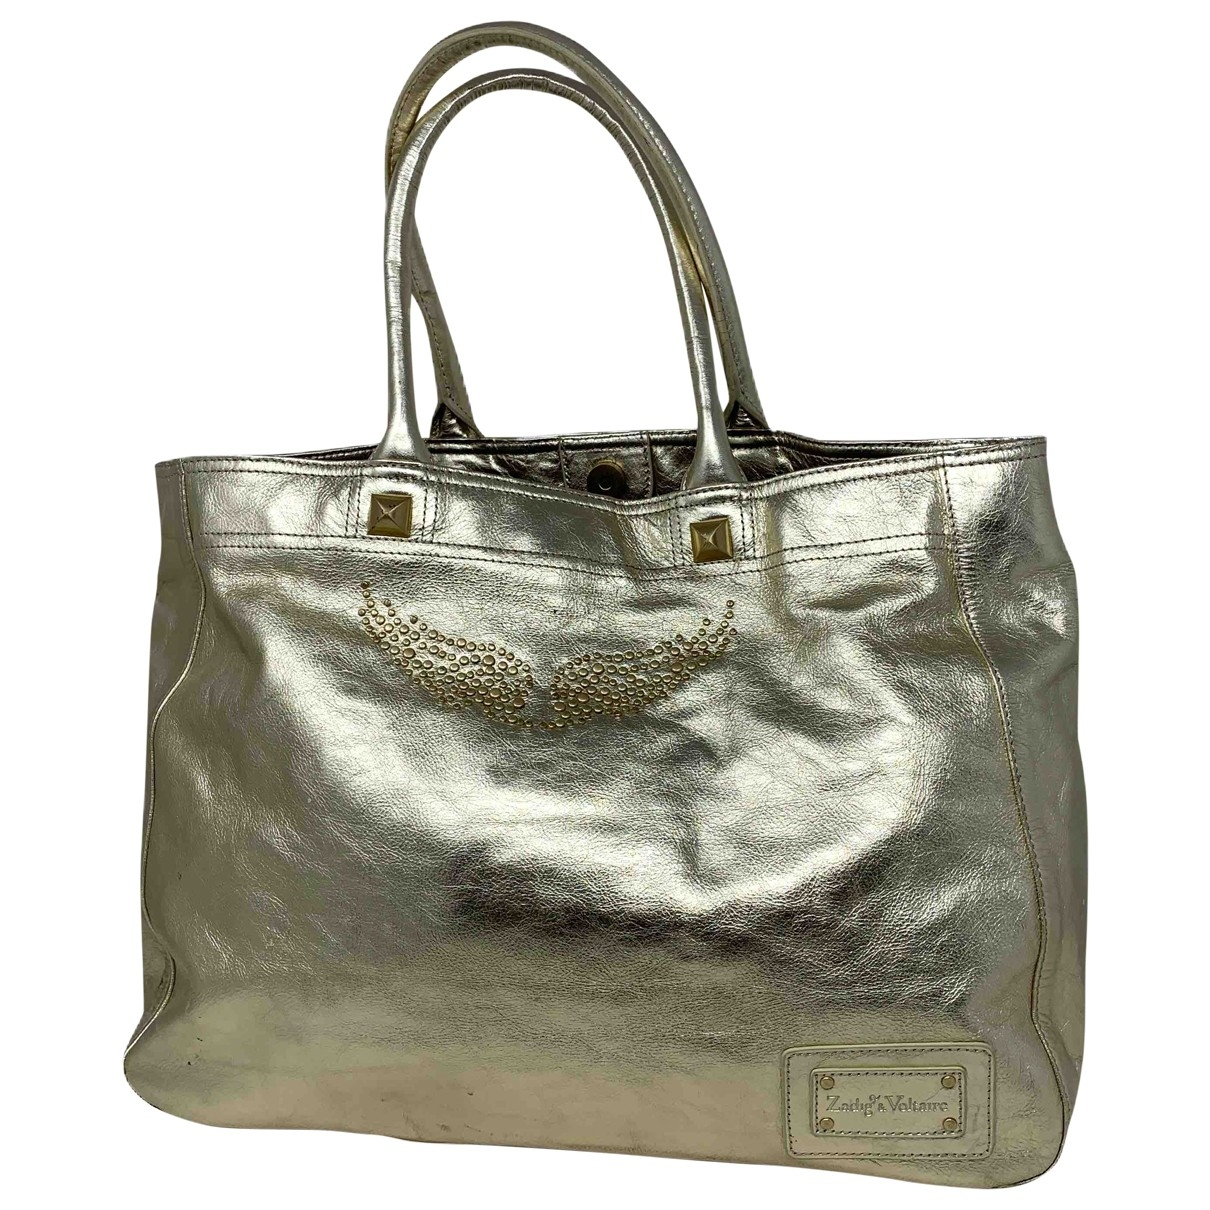 Zadig & Voltaire \N Gold Leather handbag for Women \N